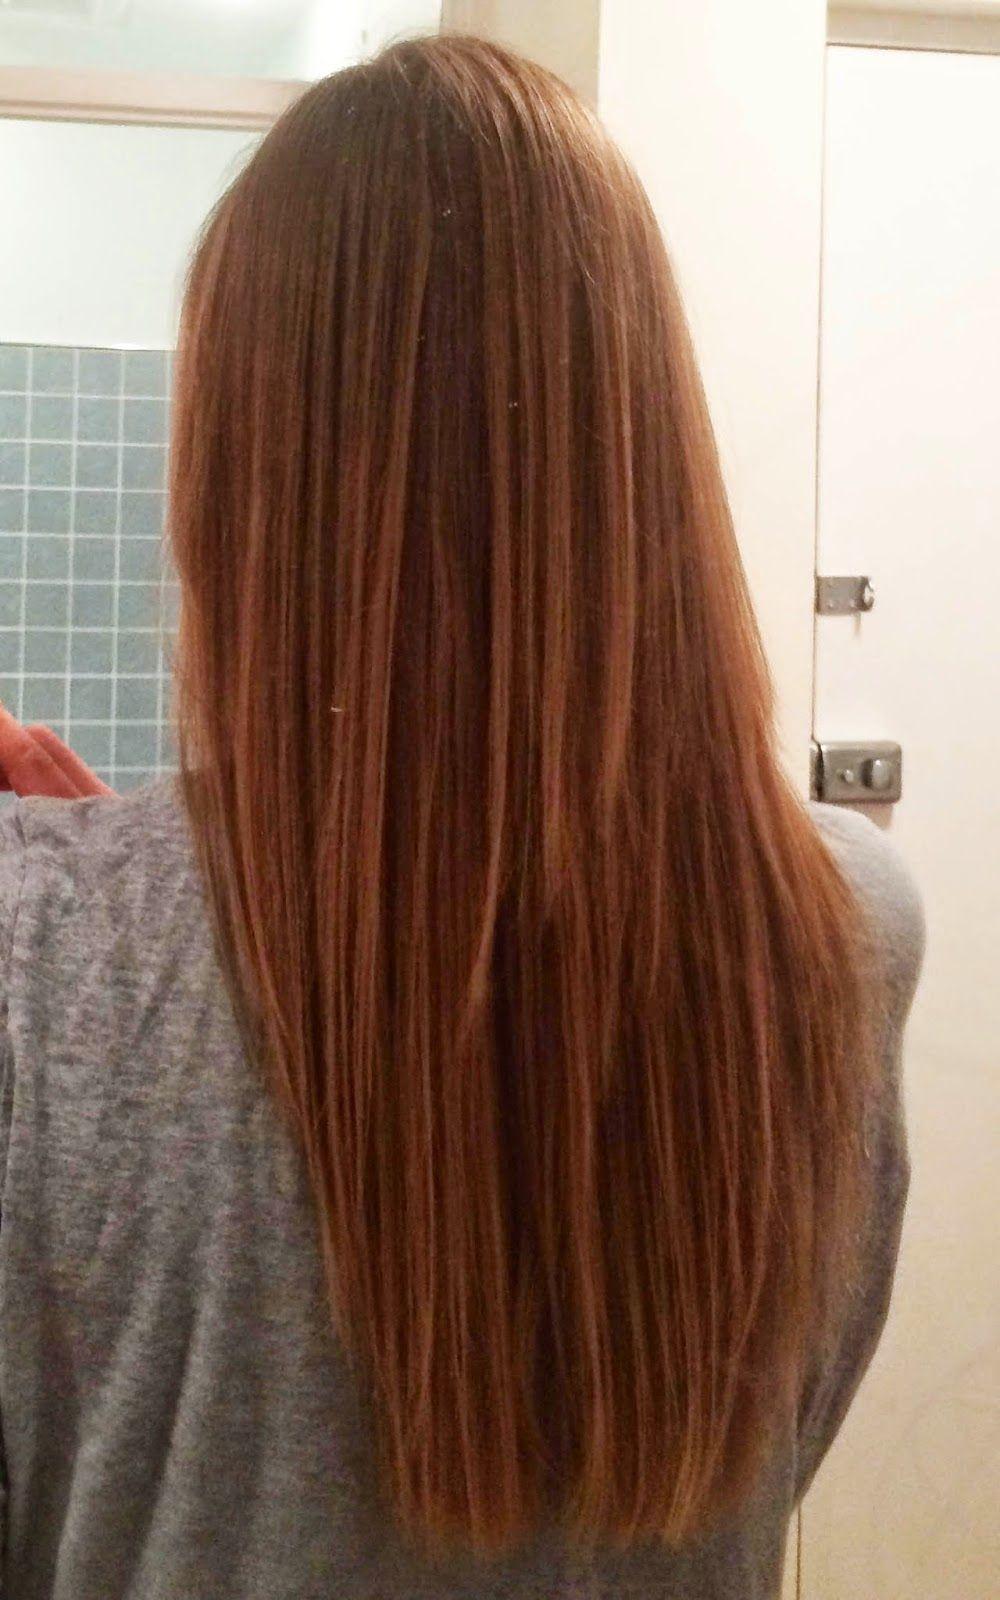 Fundamentally Flawless Tresemme Keratin Smooth Collection Review Tresemme Keratin Smooth Cabello Hair Long Hair Styles